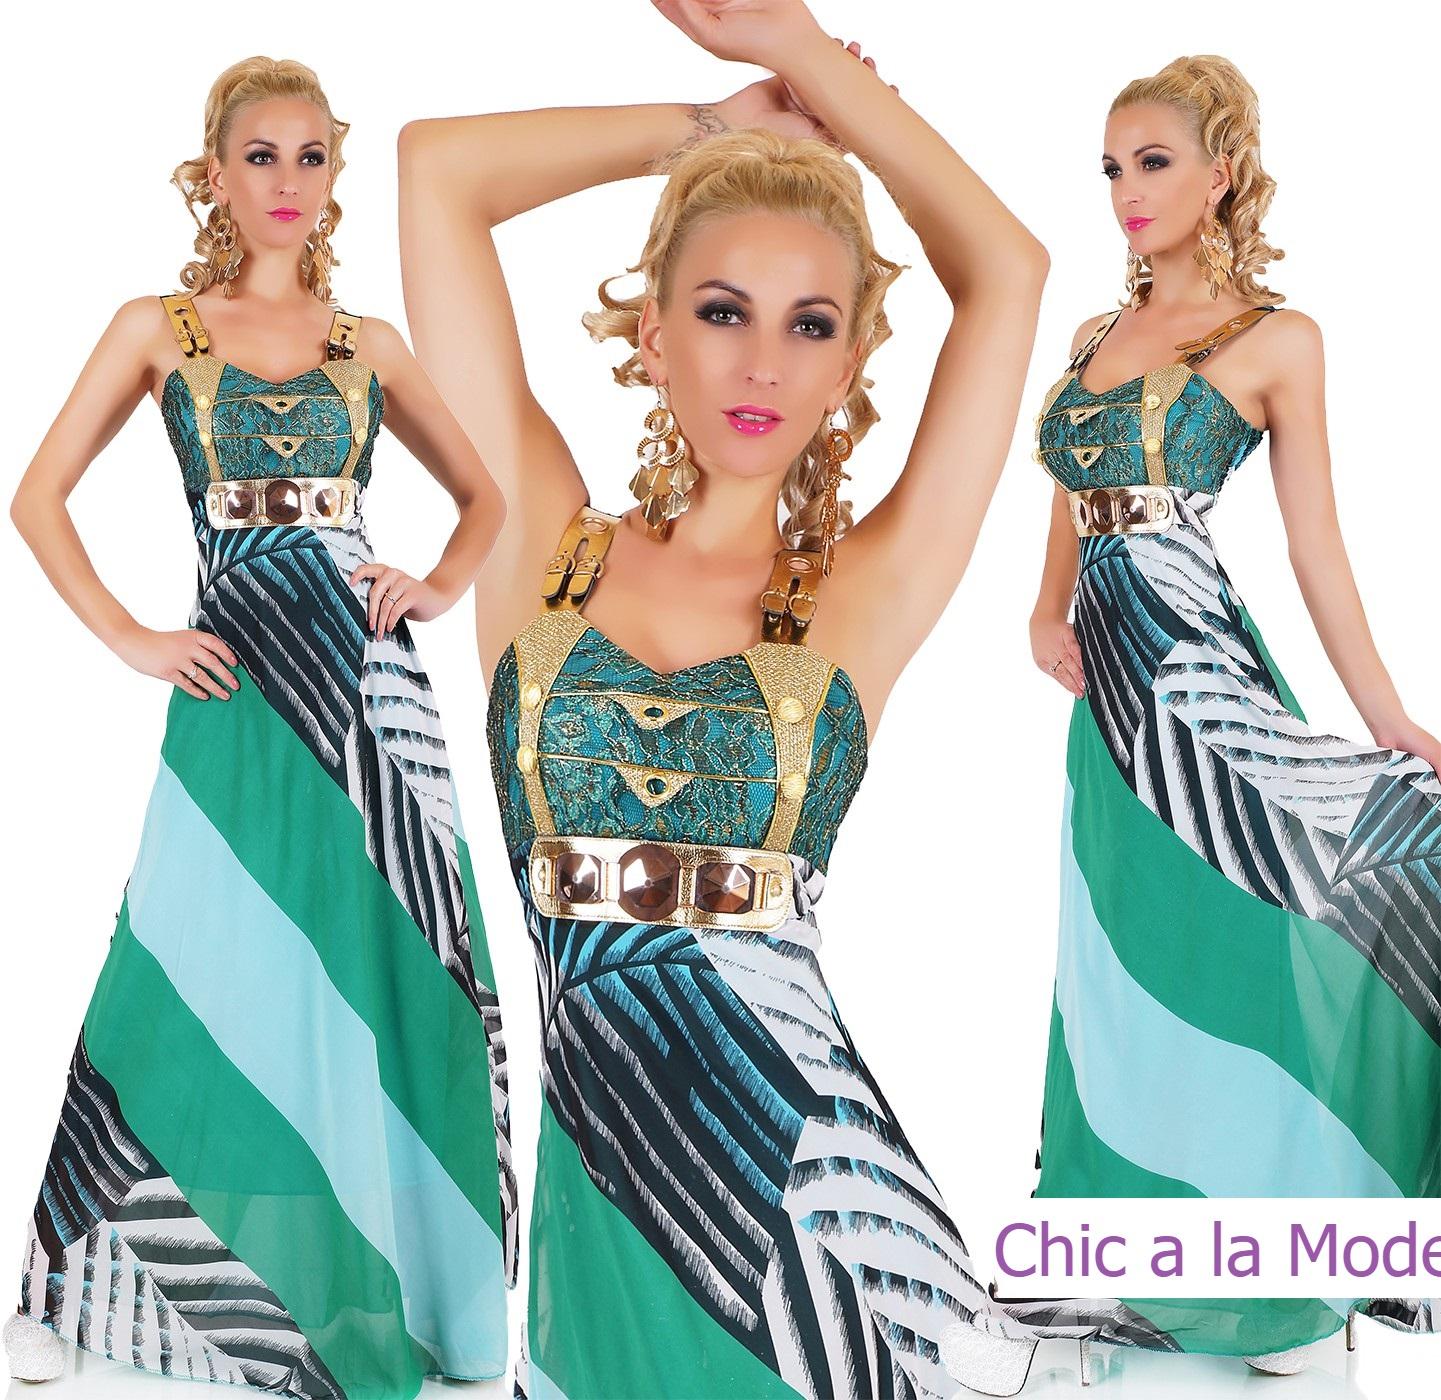 Chic a la mode